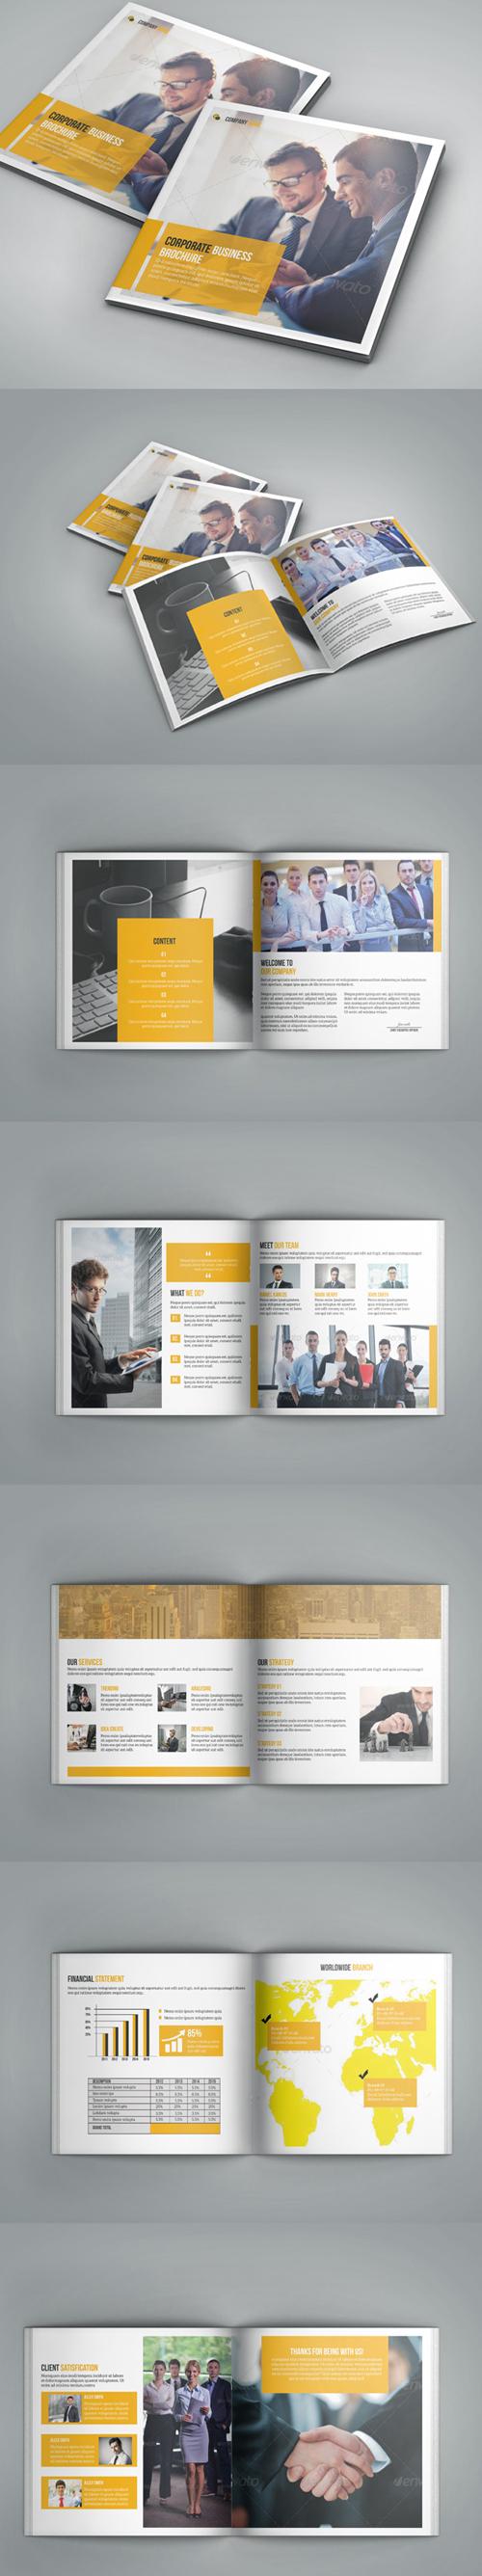 Square Bi-Fold Business Brochure Template